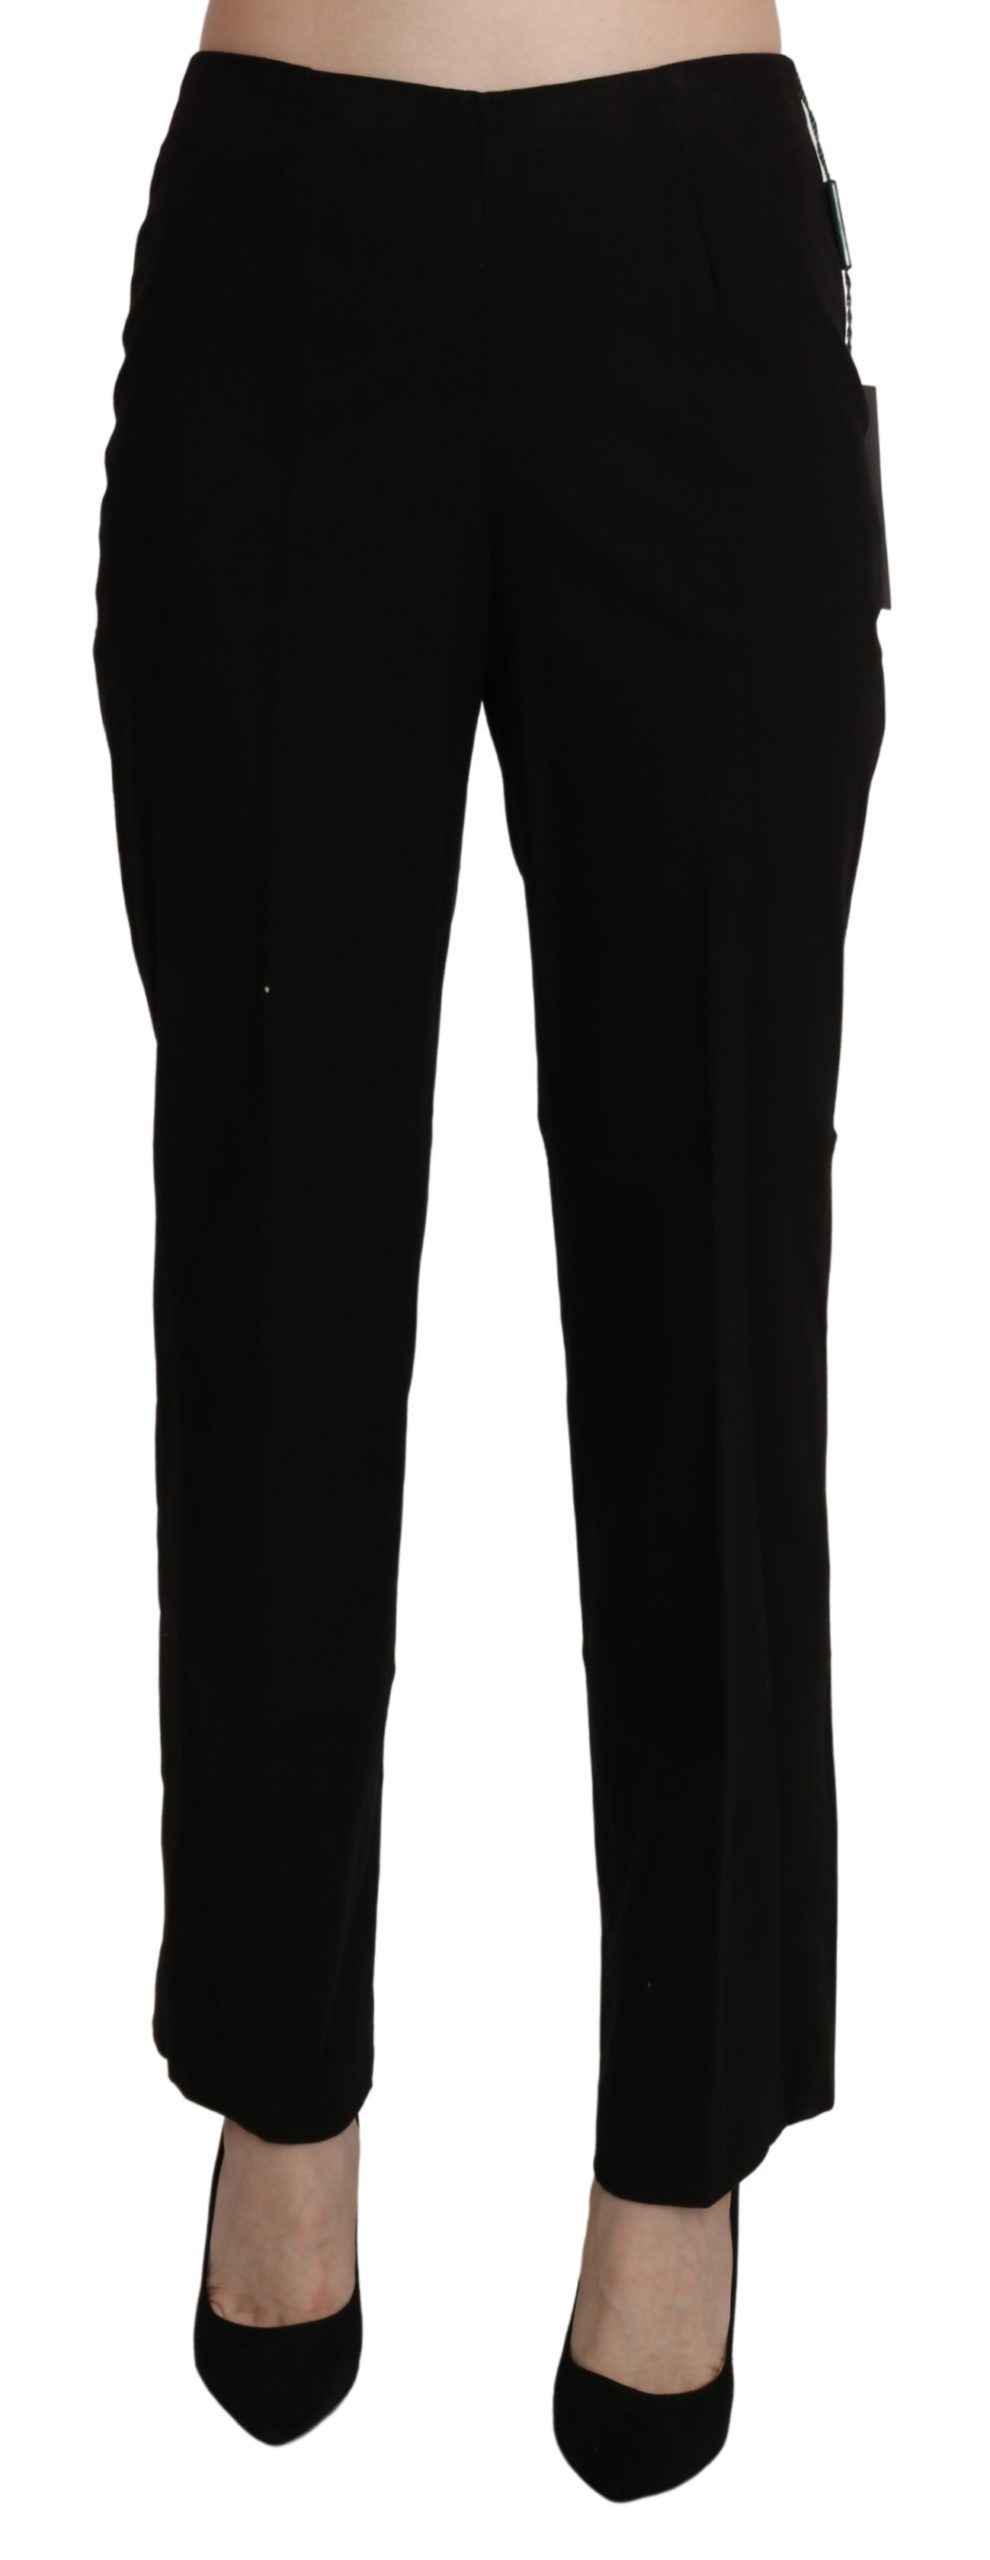 BENCIVENGA Women's High Waist Straight Cropped Trousers Black PAN71372-42 - IT48|XXL